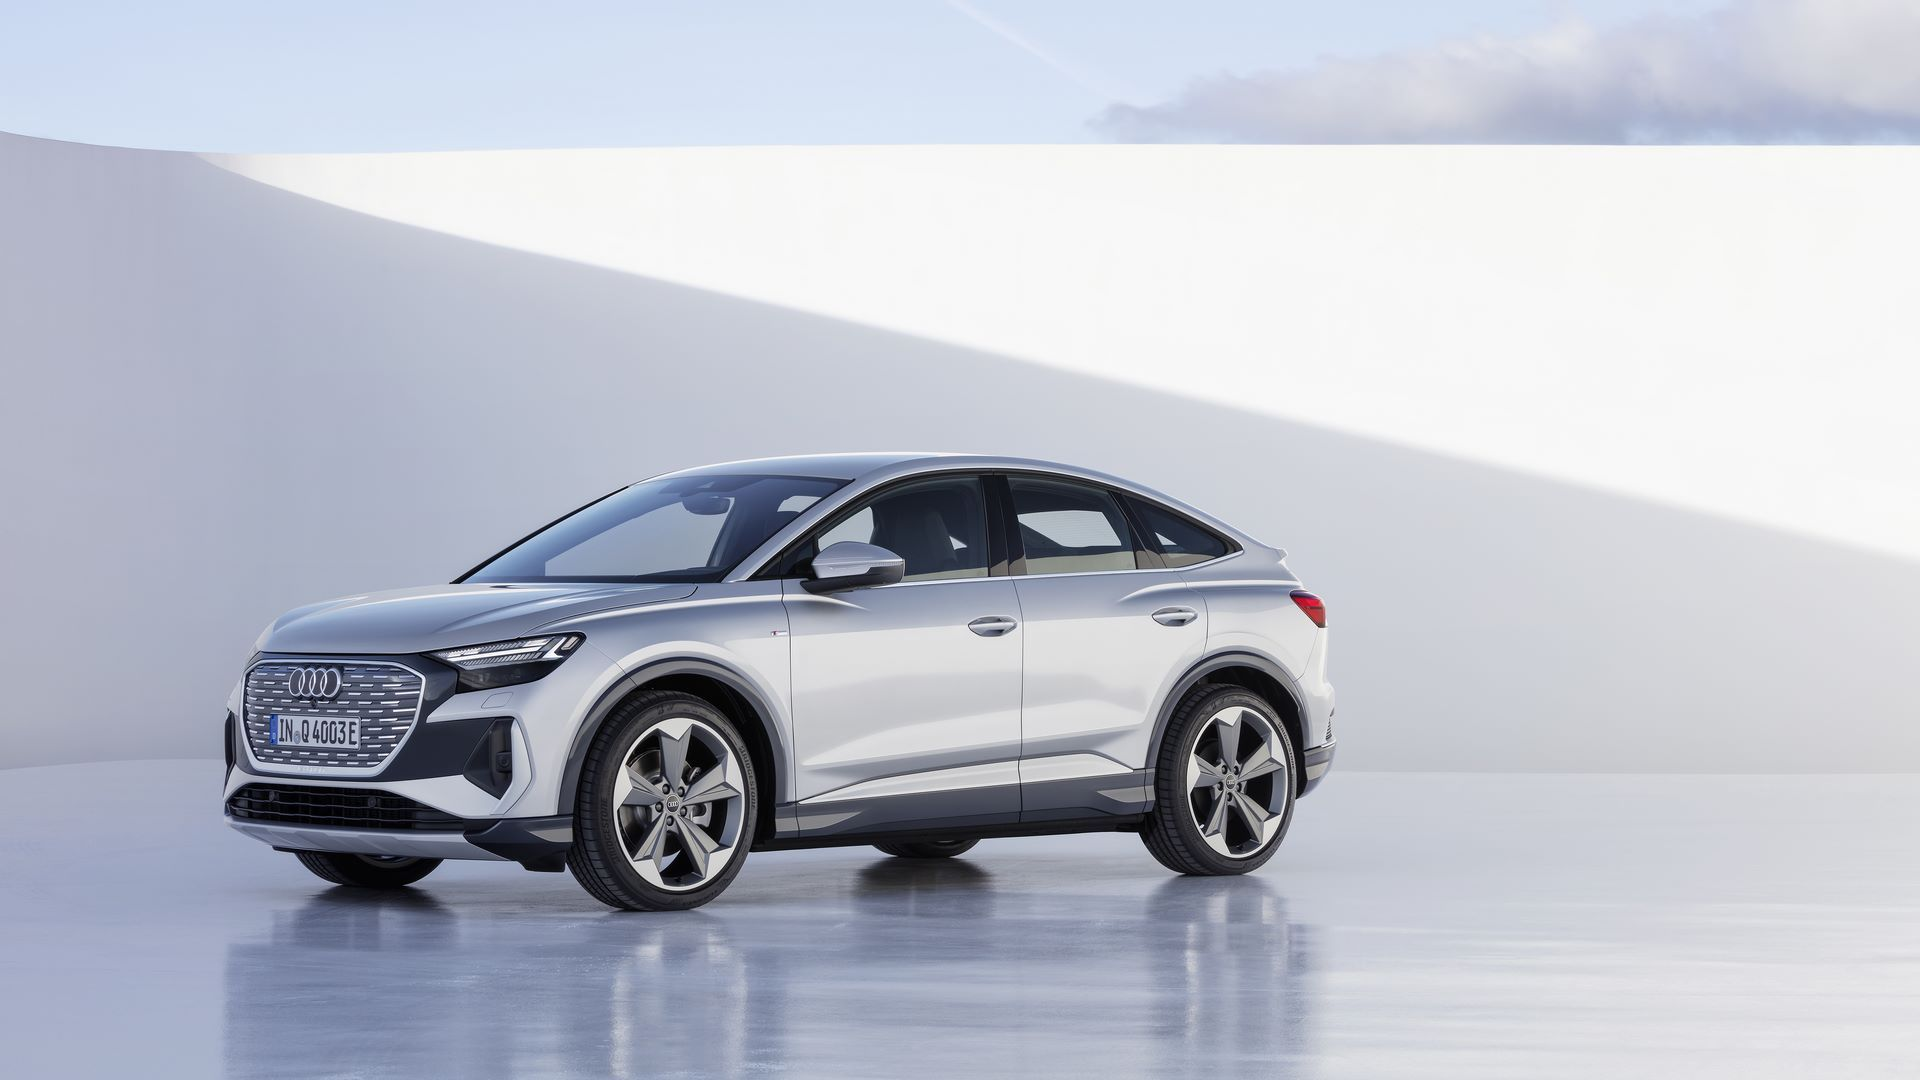 Audi-Q4-e-tron-and-Q4-e-tron-Sportback-33